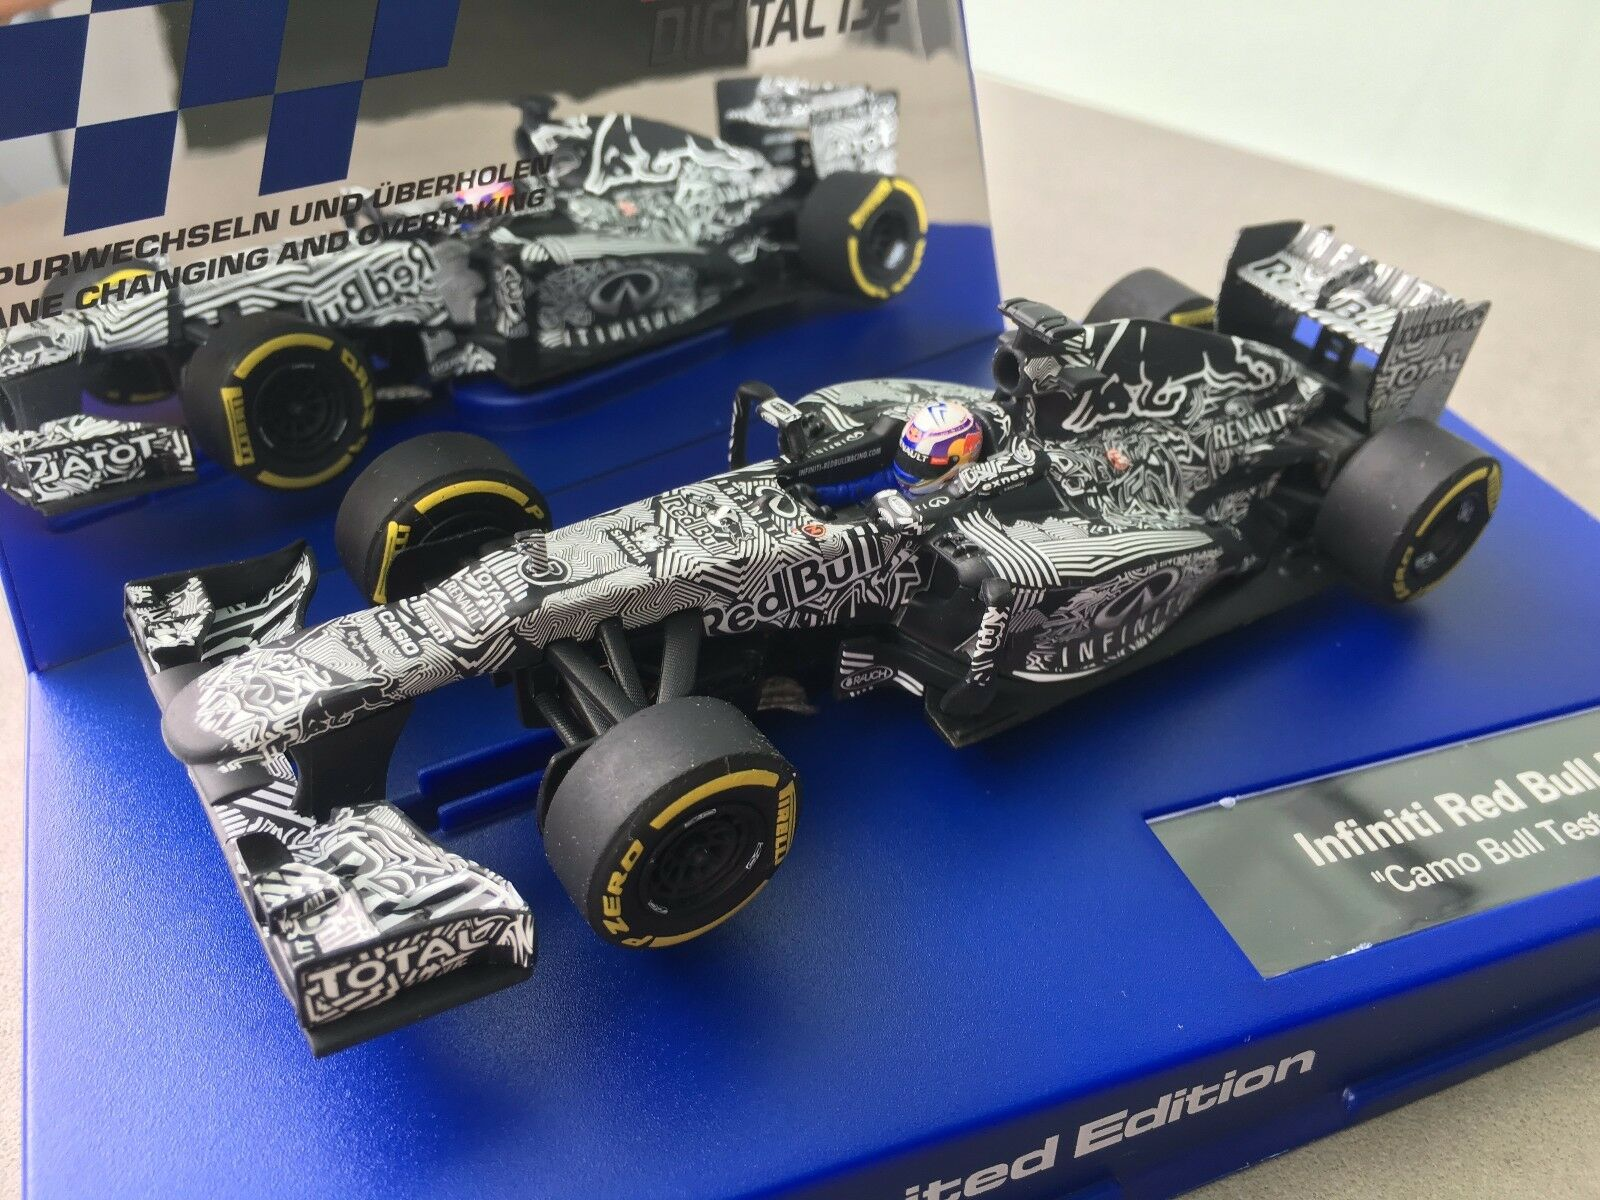 Carrera Digital 132 30729 Limited Edition 2015 Infinity Red Bull Racing Nip